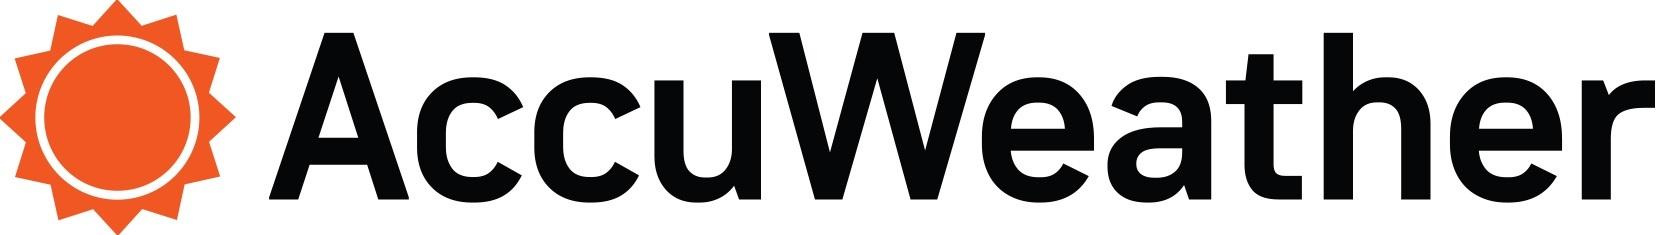 AccuWeather_Inc_Logo